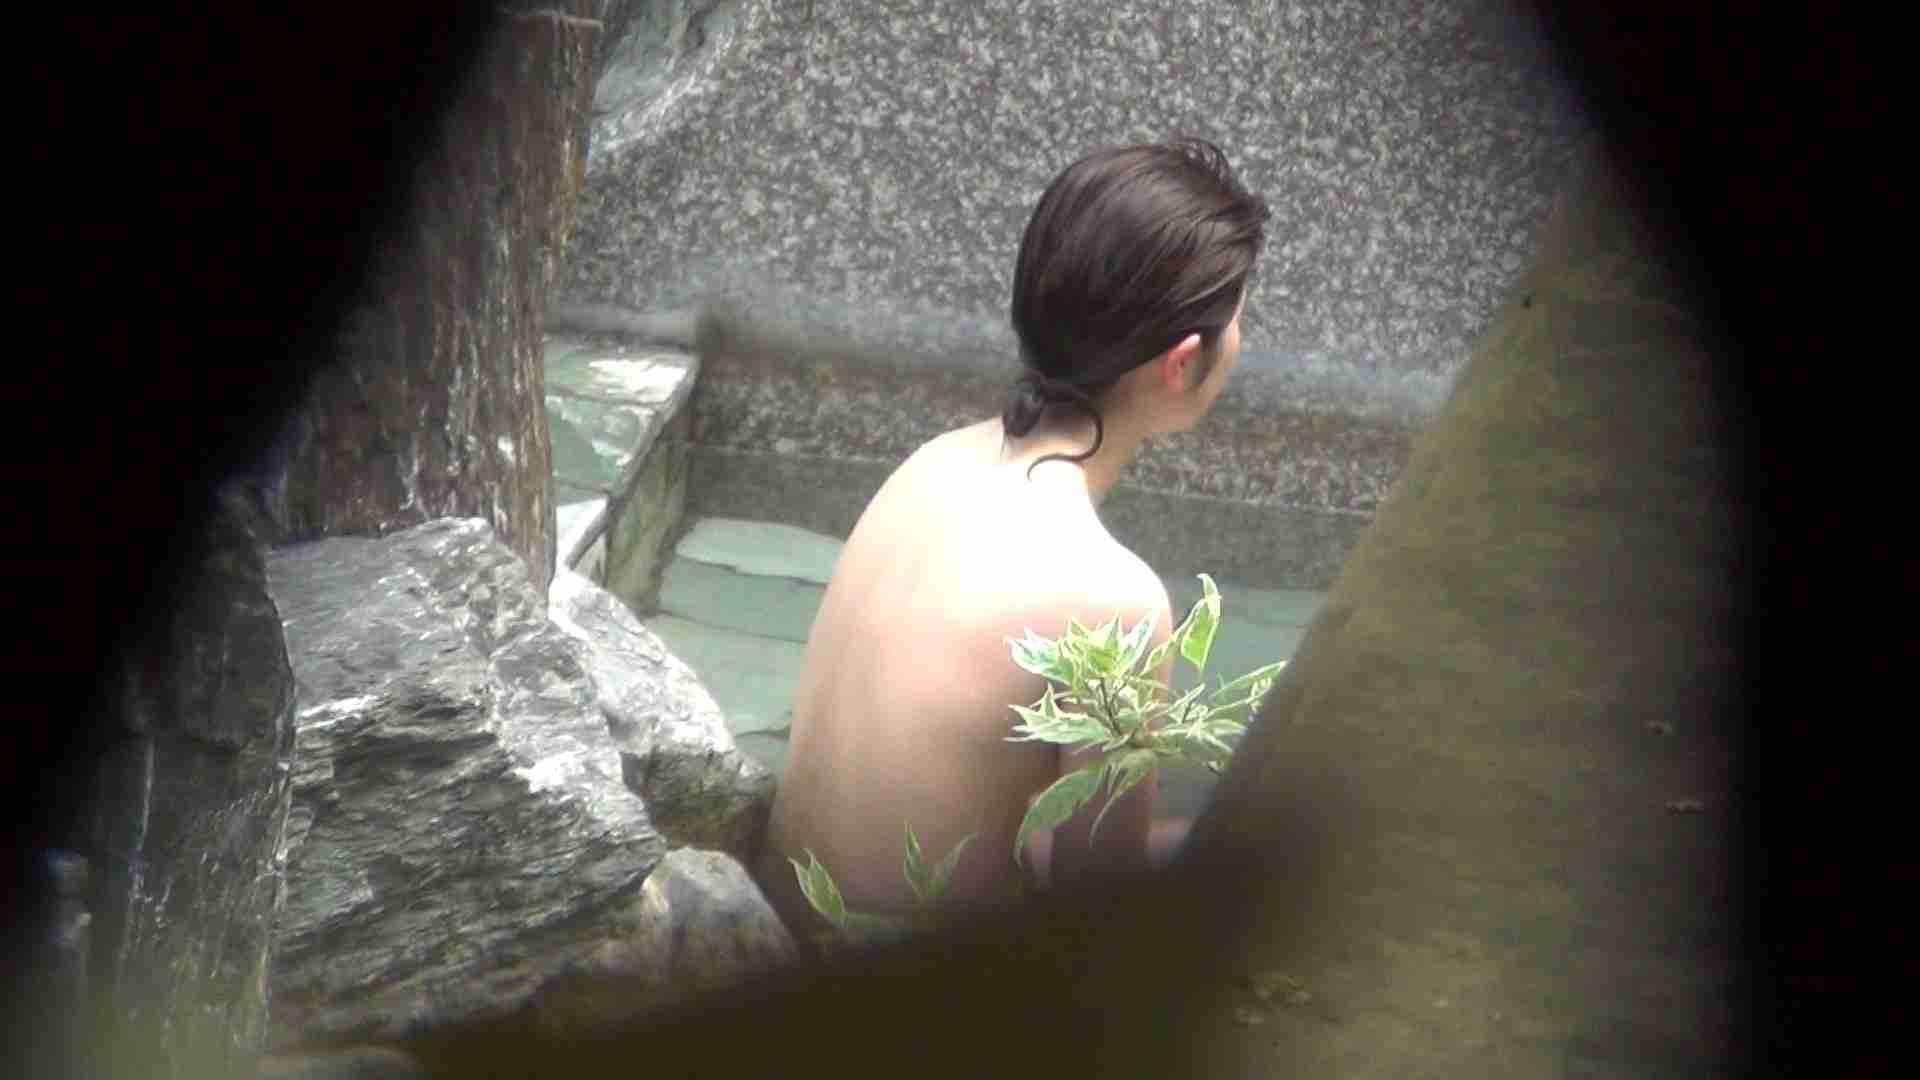 Aquaな露天風呂Vol.262 HなOL | 盗撮  73pic 57